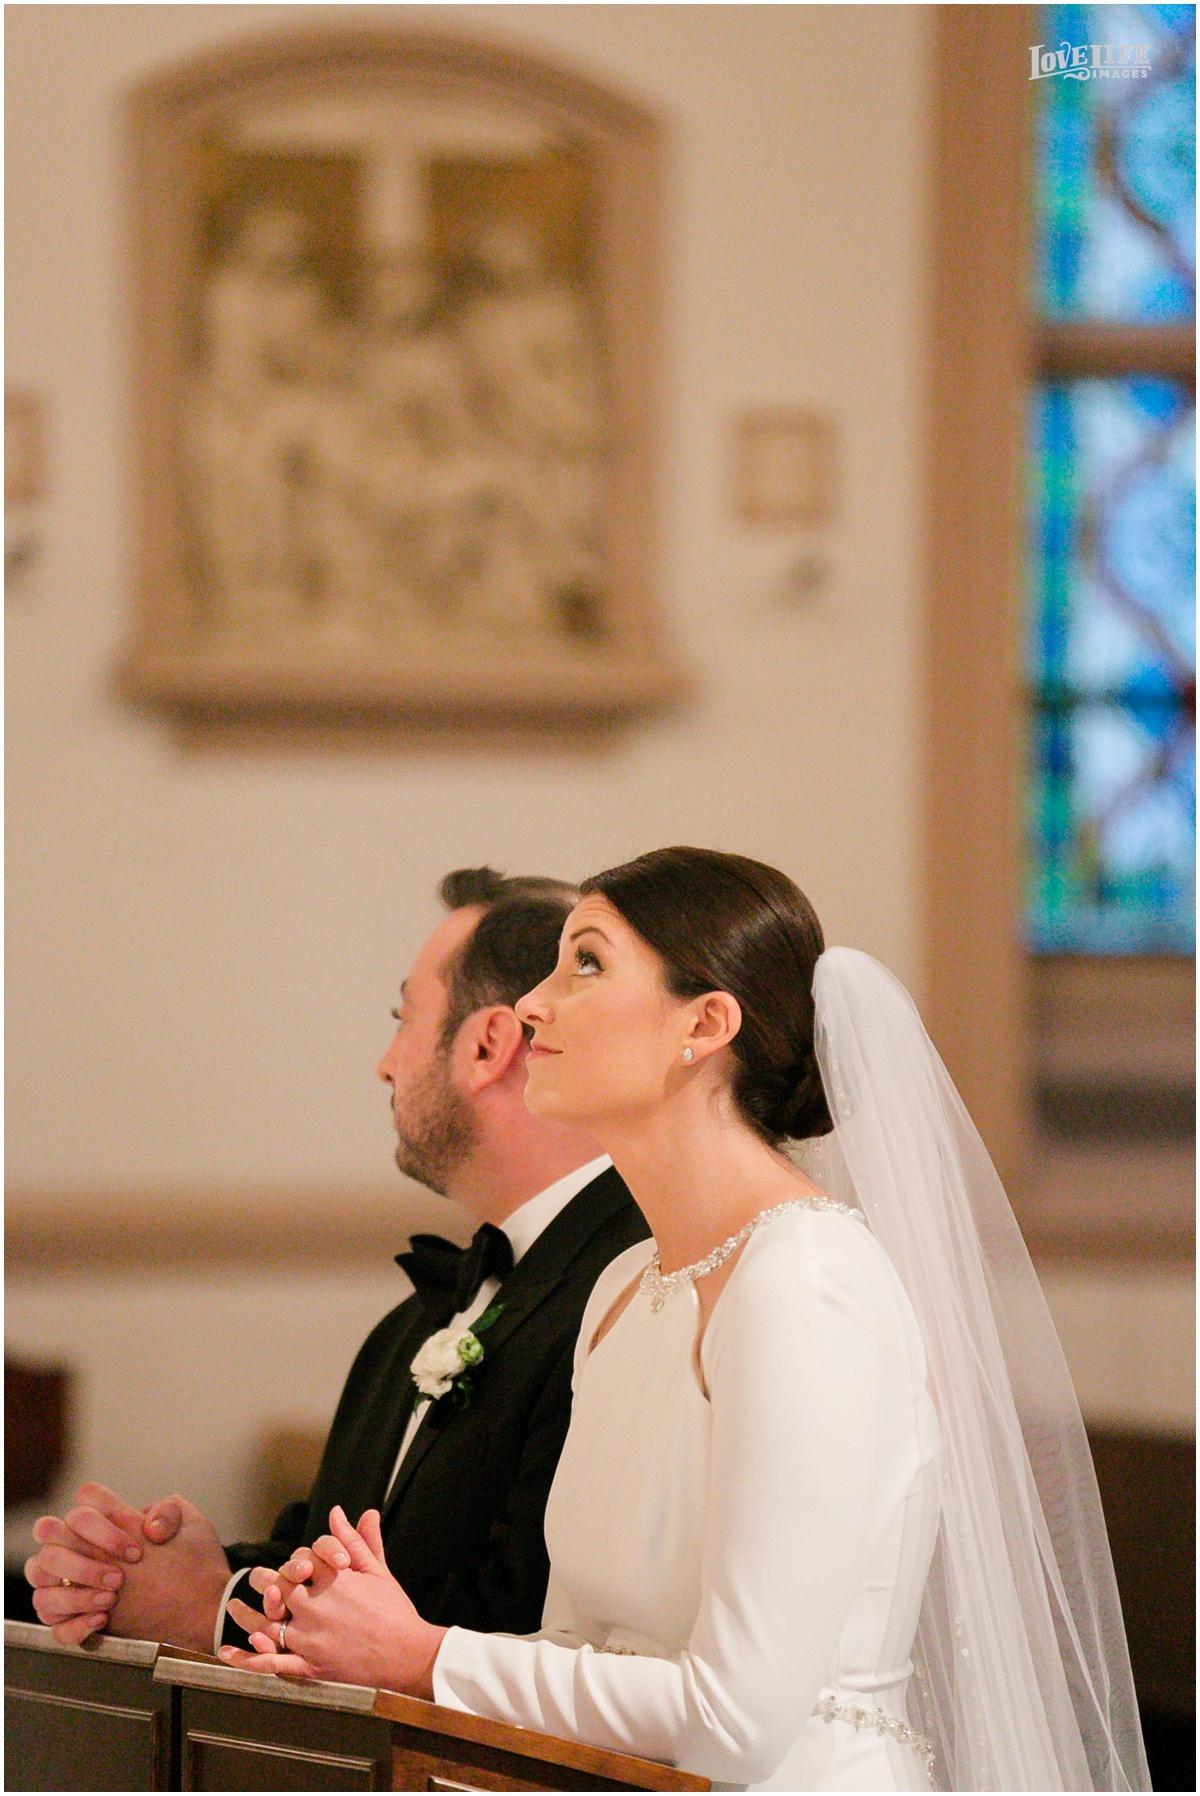 Winter District Winery Wedding bride groom prayers.JPG